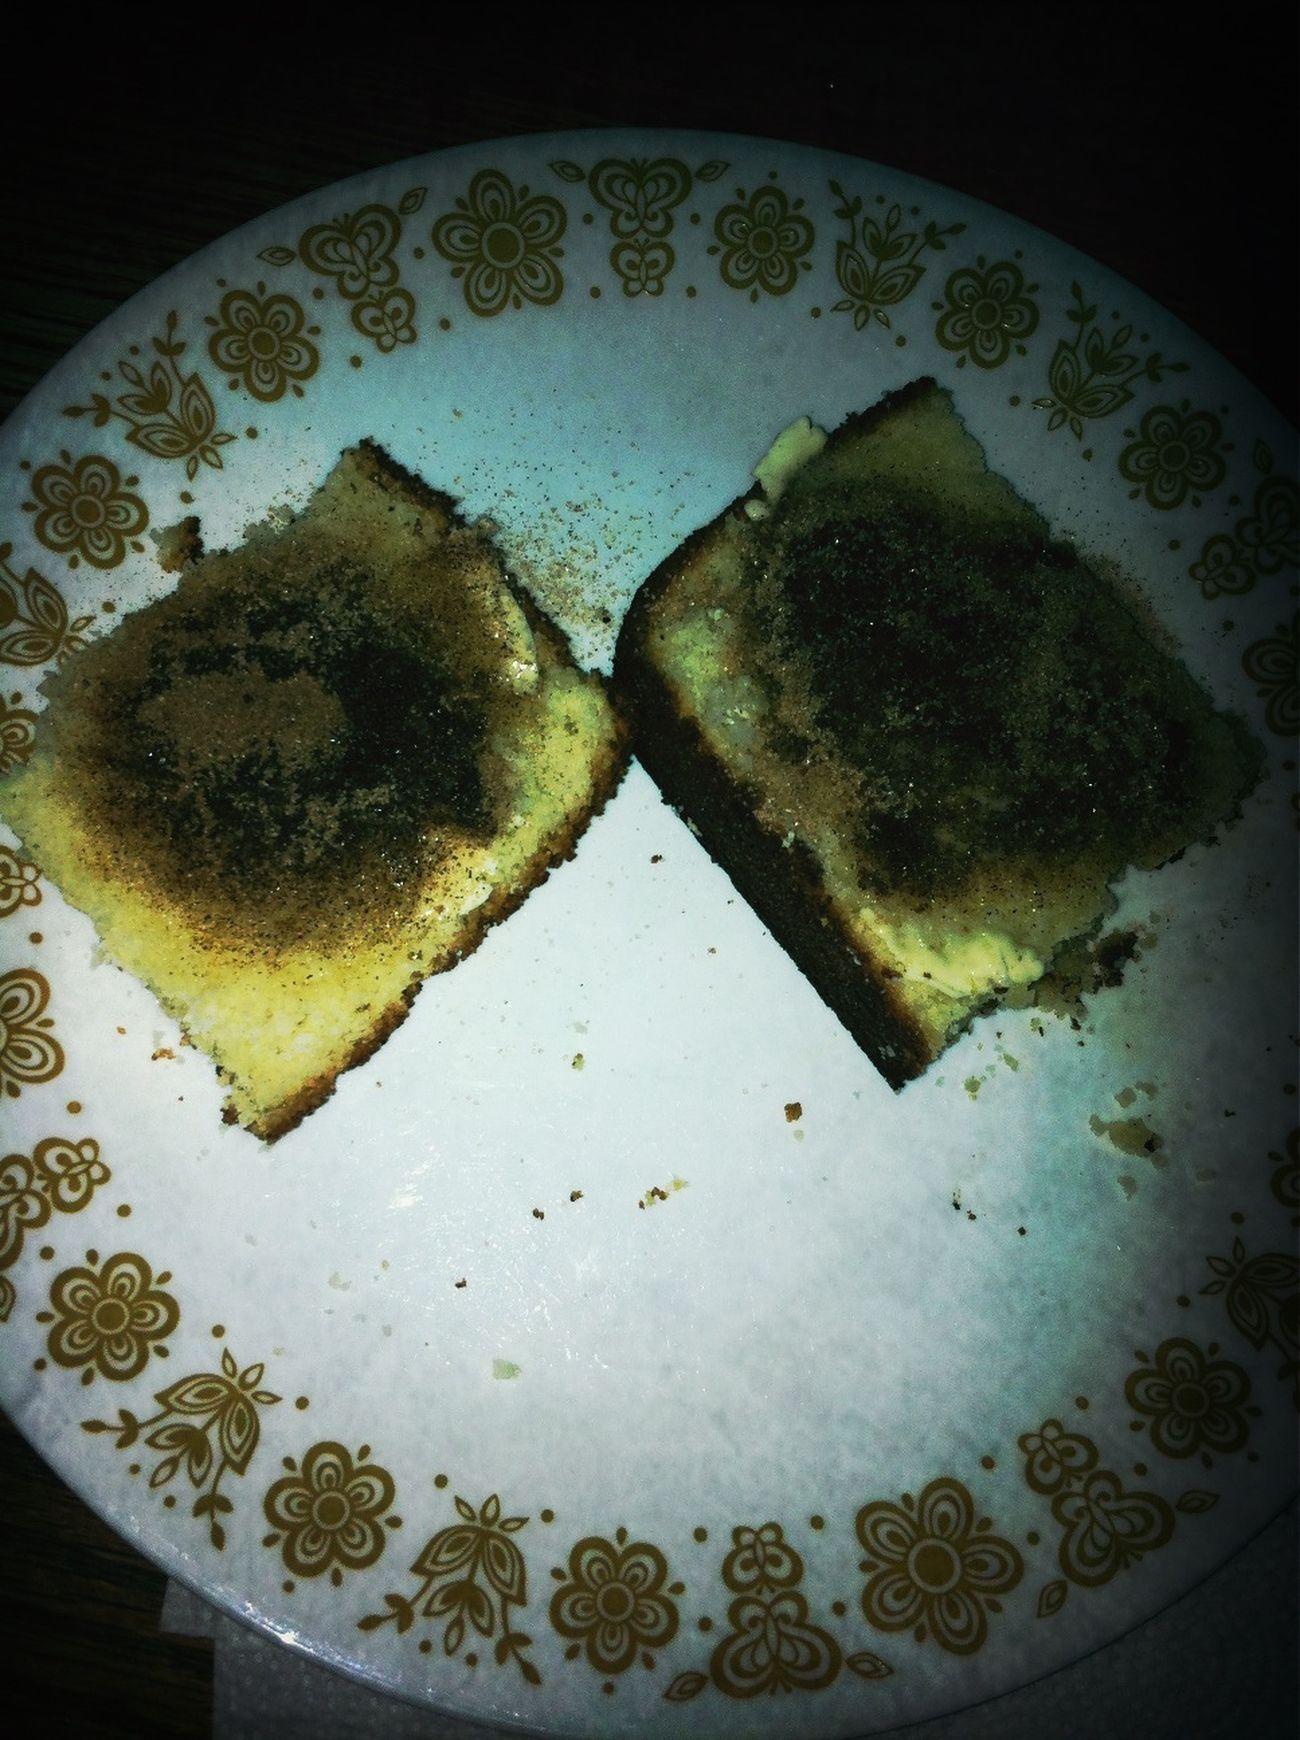 Best way to eat corn bread